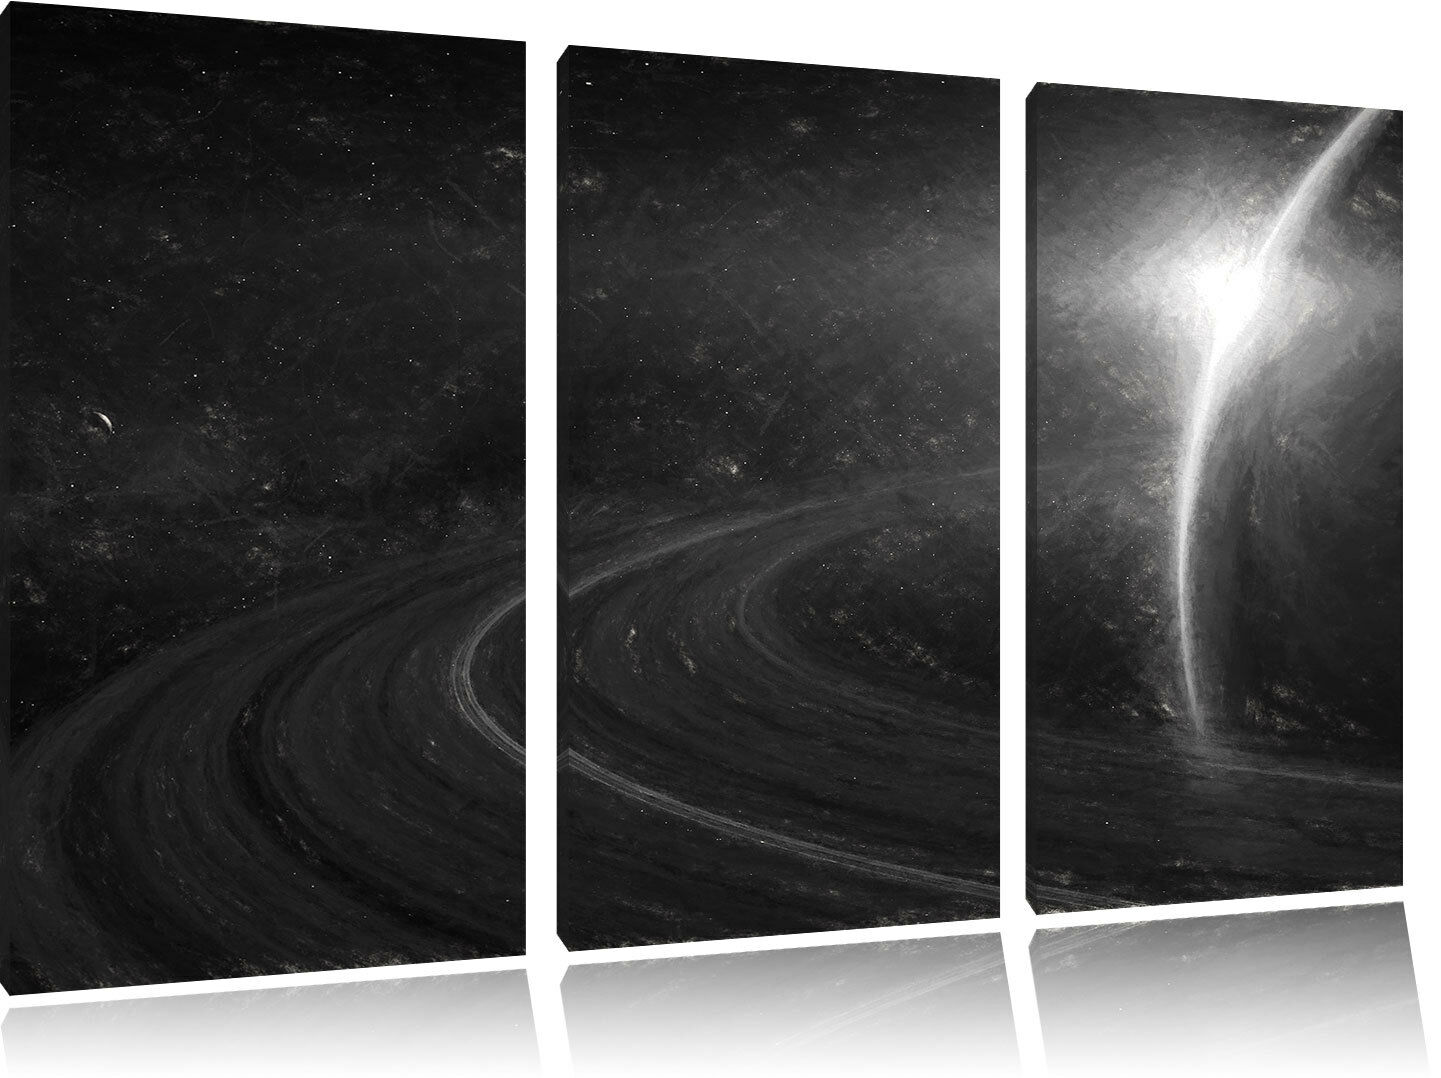 Kosmischer Kosmischer Kosmischer Planet Saturn Im Universo Arte Carbone Effetto 3-Teiler Quadro su Tel 36eed5